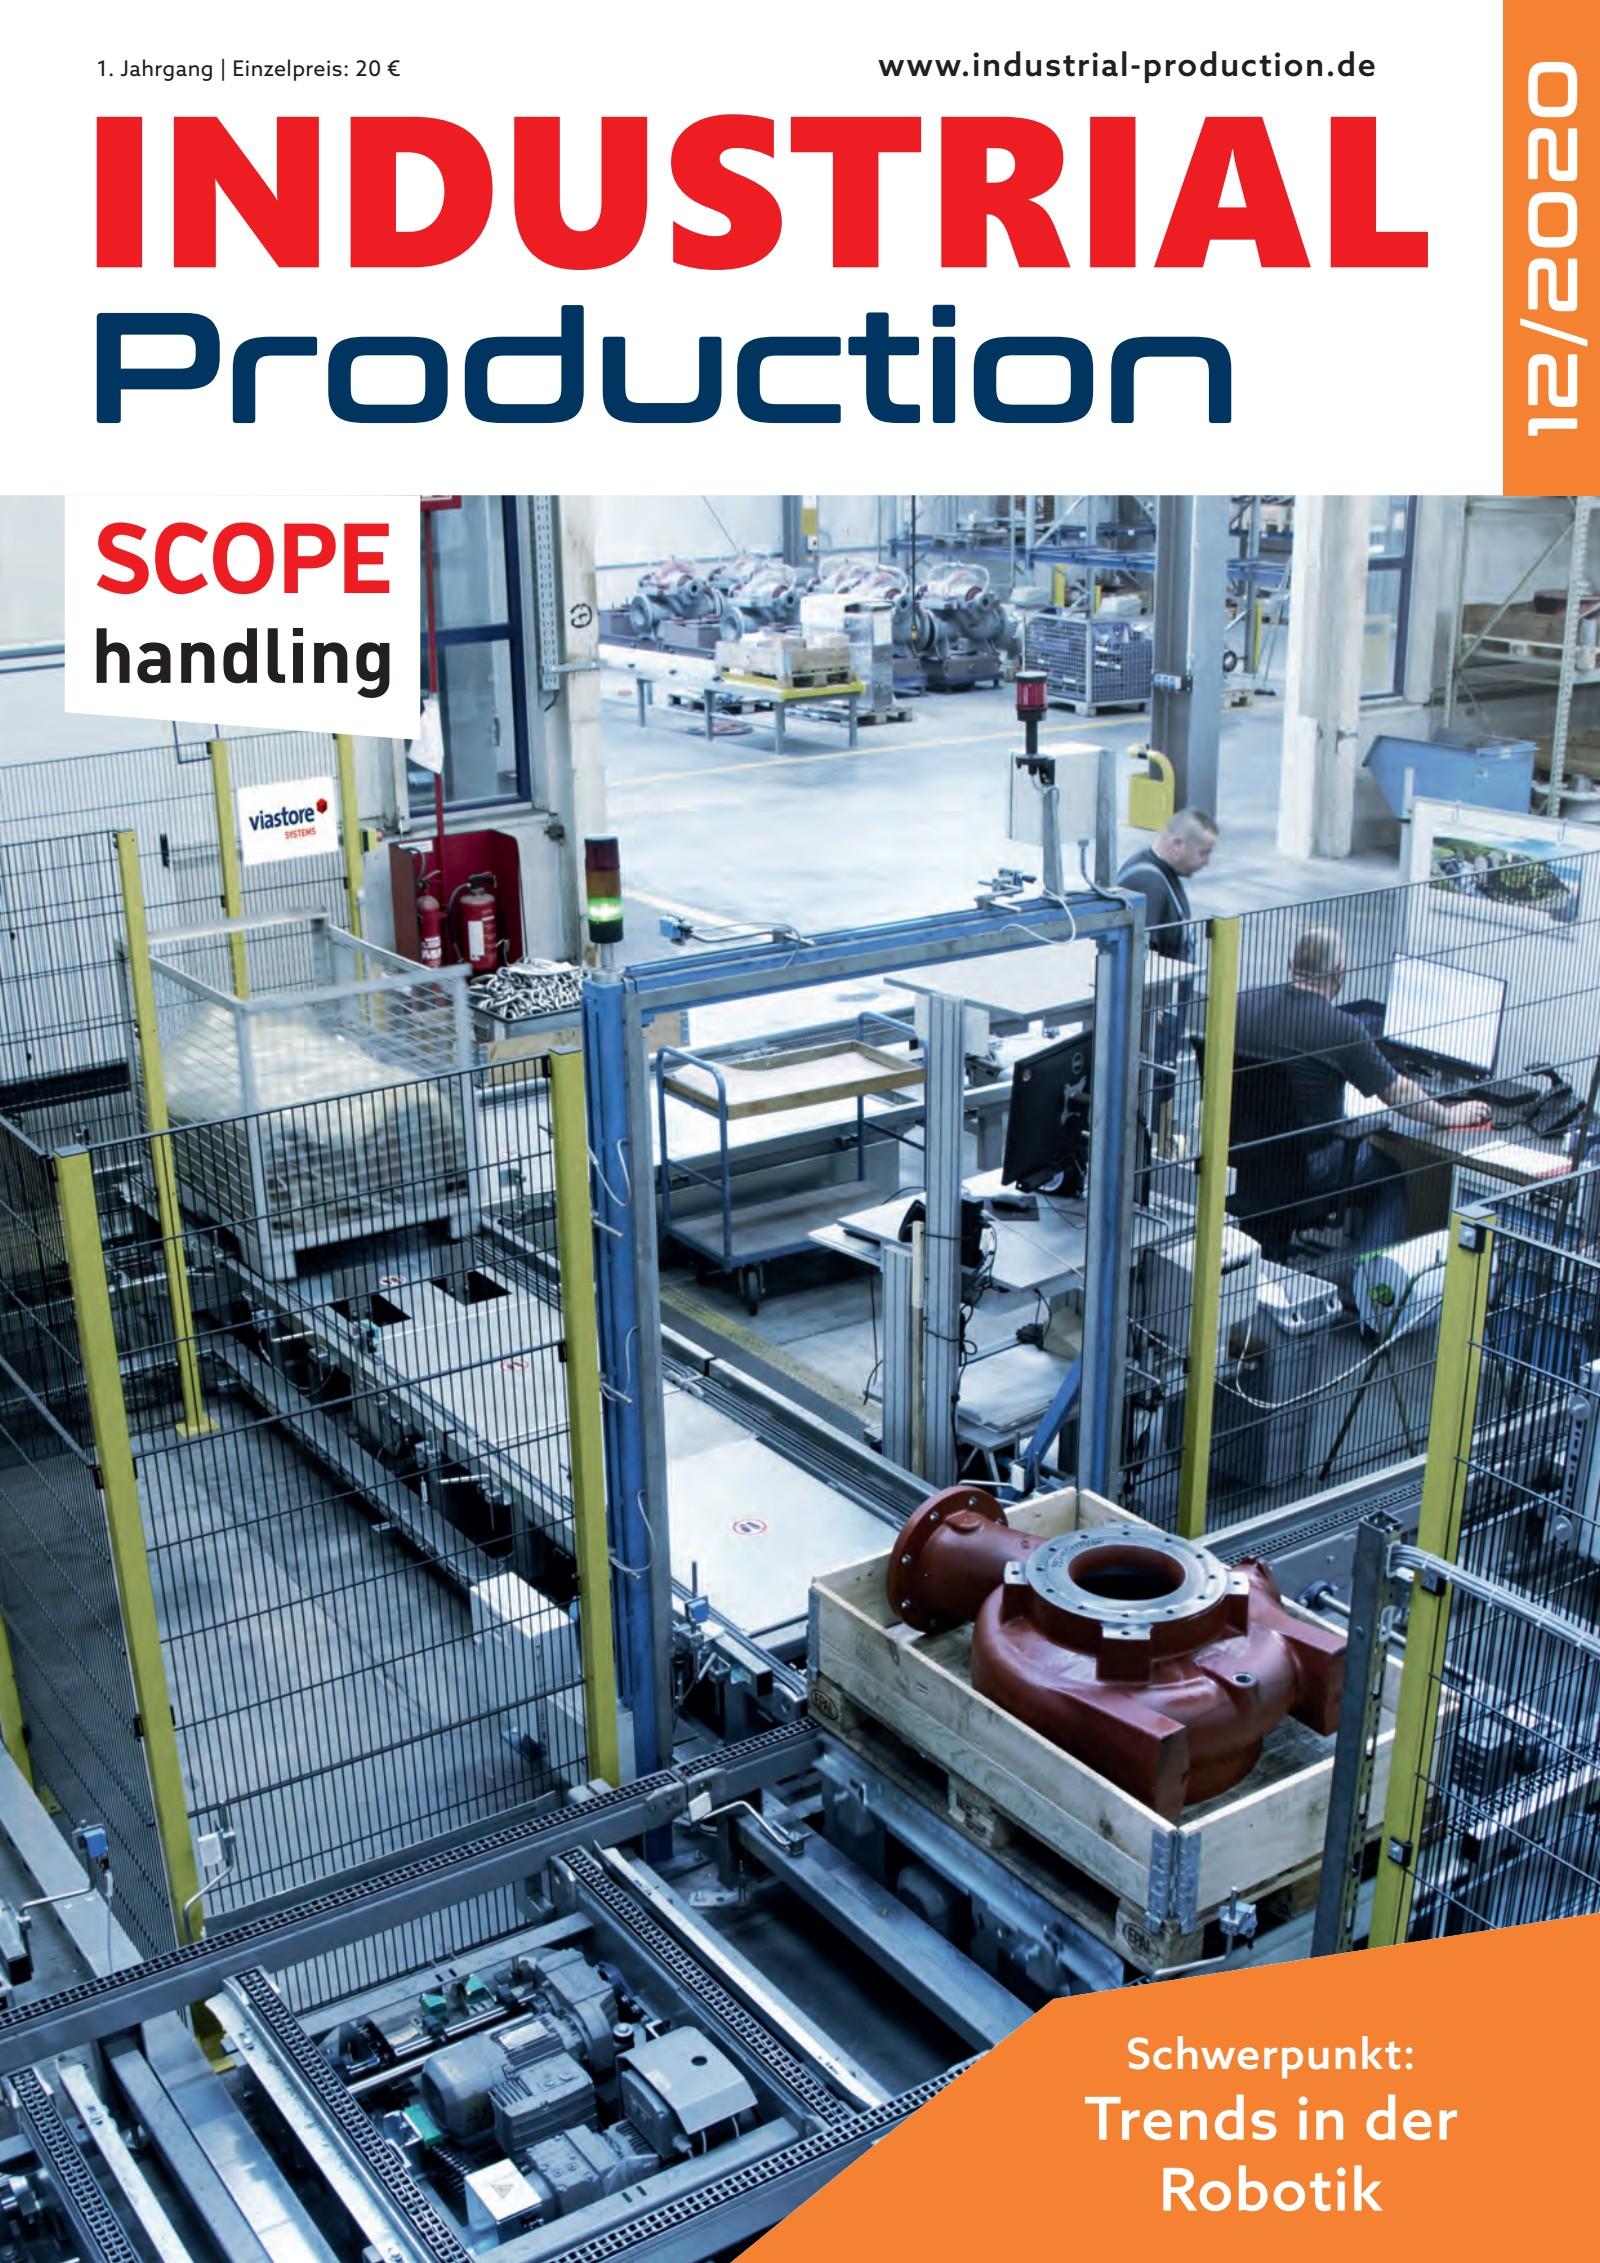 INDUSTRIAL Production 12/2020 Digital